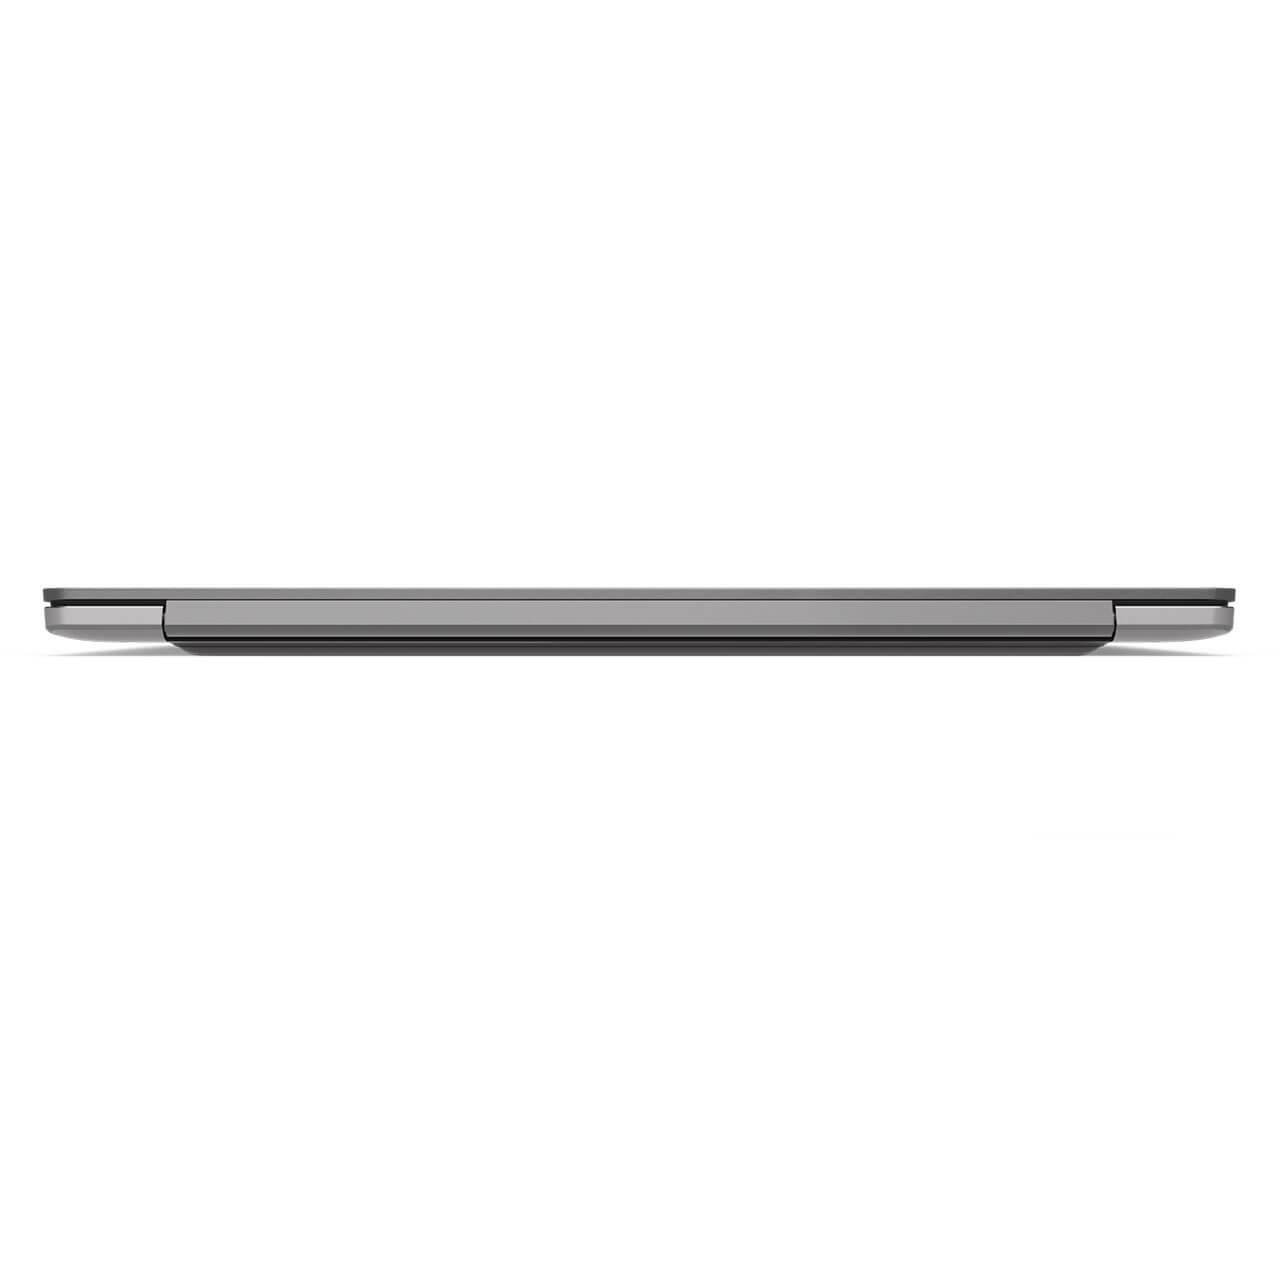 "Lenovo Ideapad 530S, 15.6"", i7-8550U, 8 GB RAM, 512GB SSD, Win 10 Home 64 6"